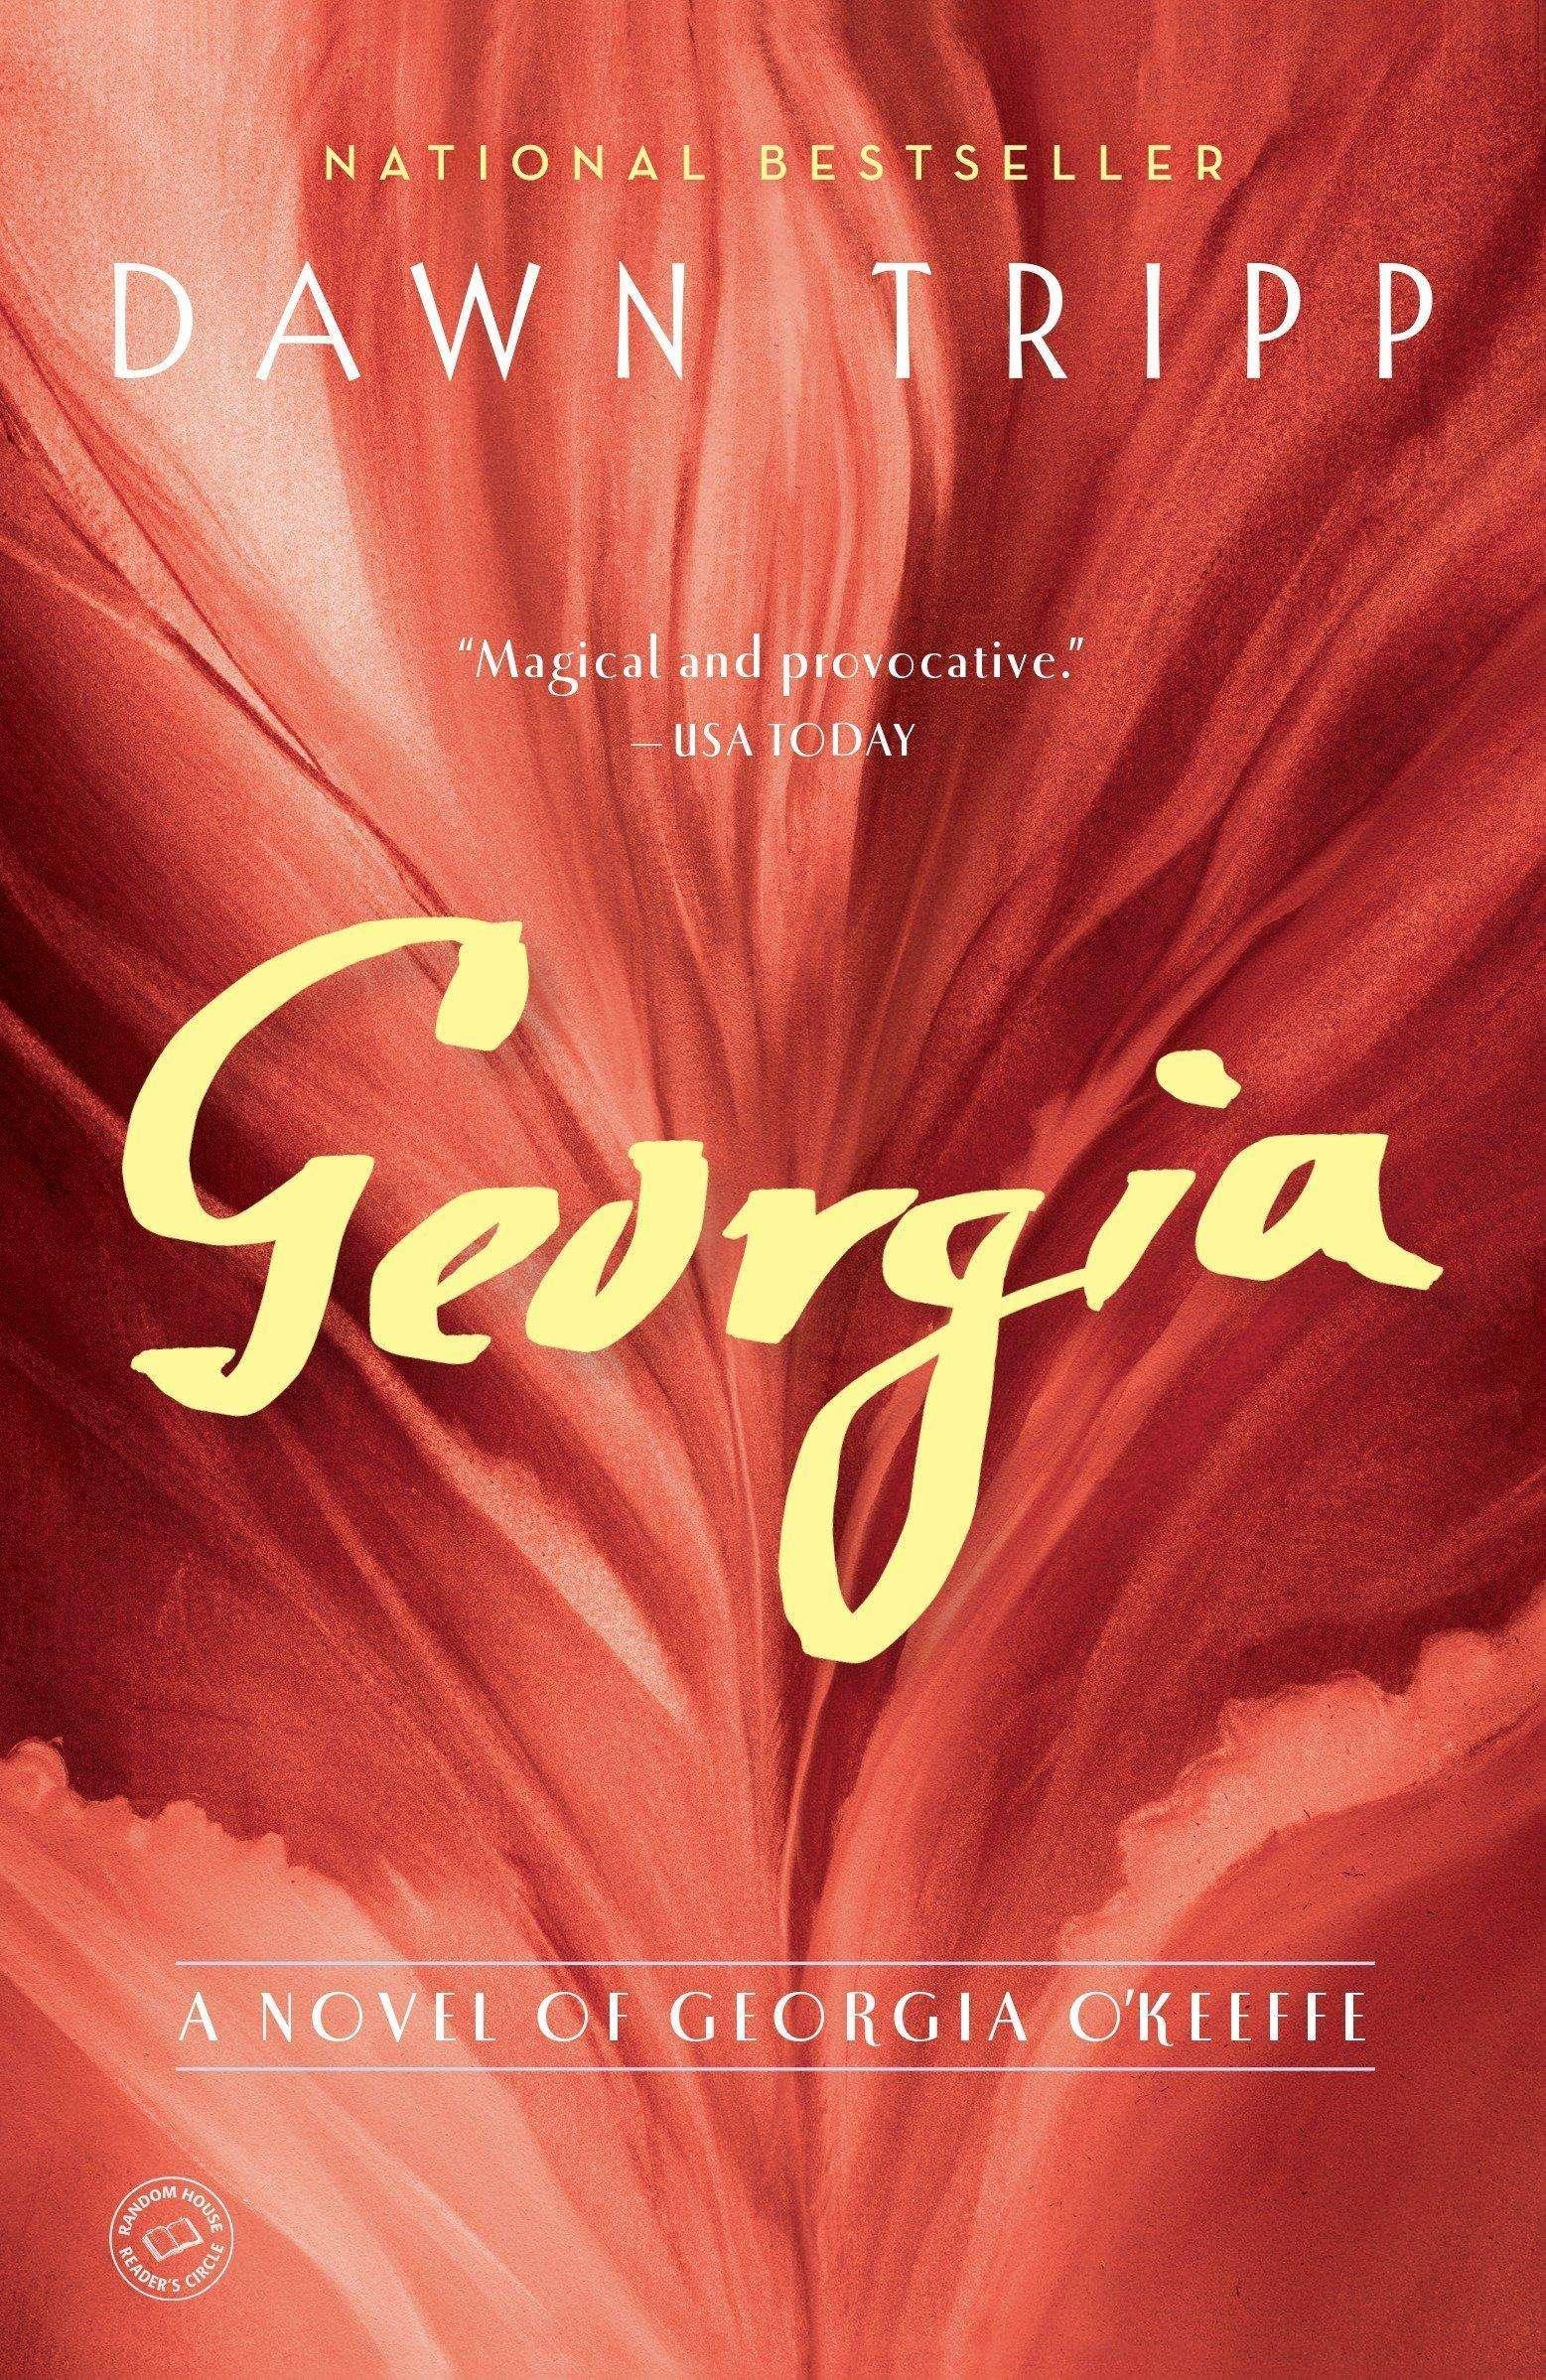 Books I Read in December 2019: Georgia by Dawn Tripp